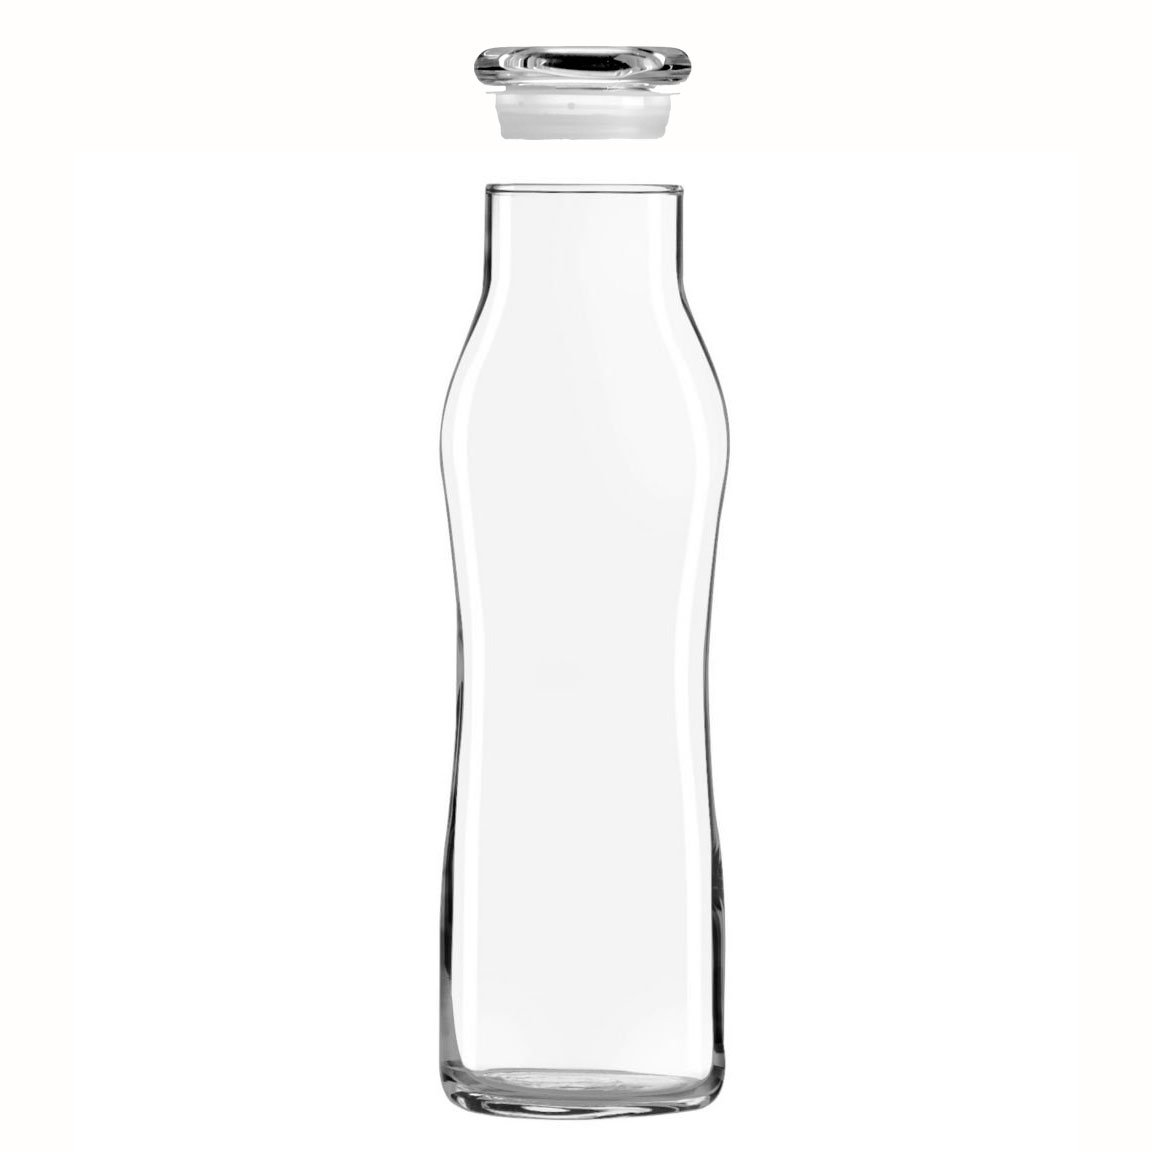 Amazon.com: Libbey Glass 22 & 24 oz Botella con tapa para ...